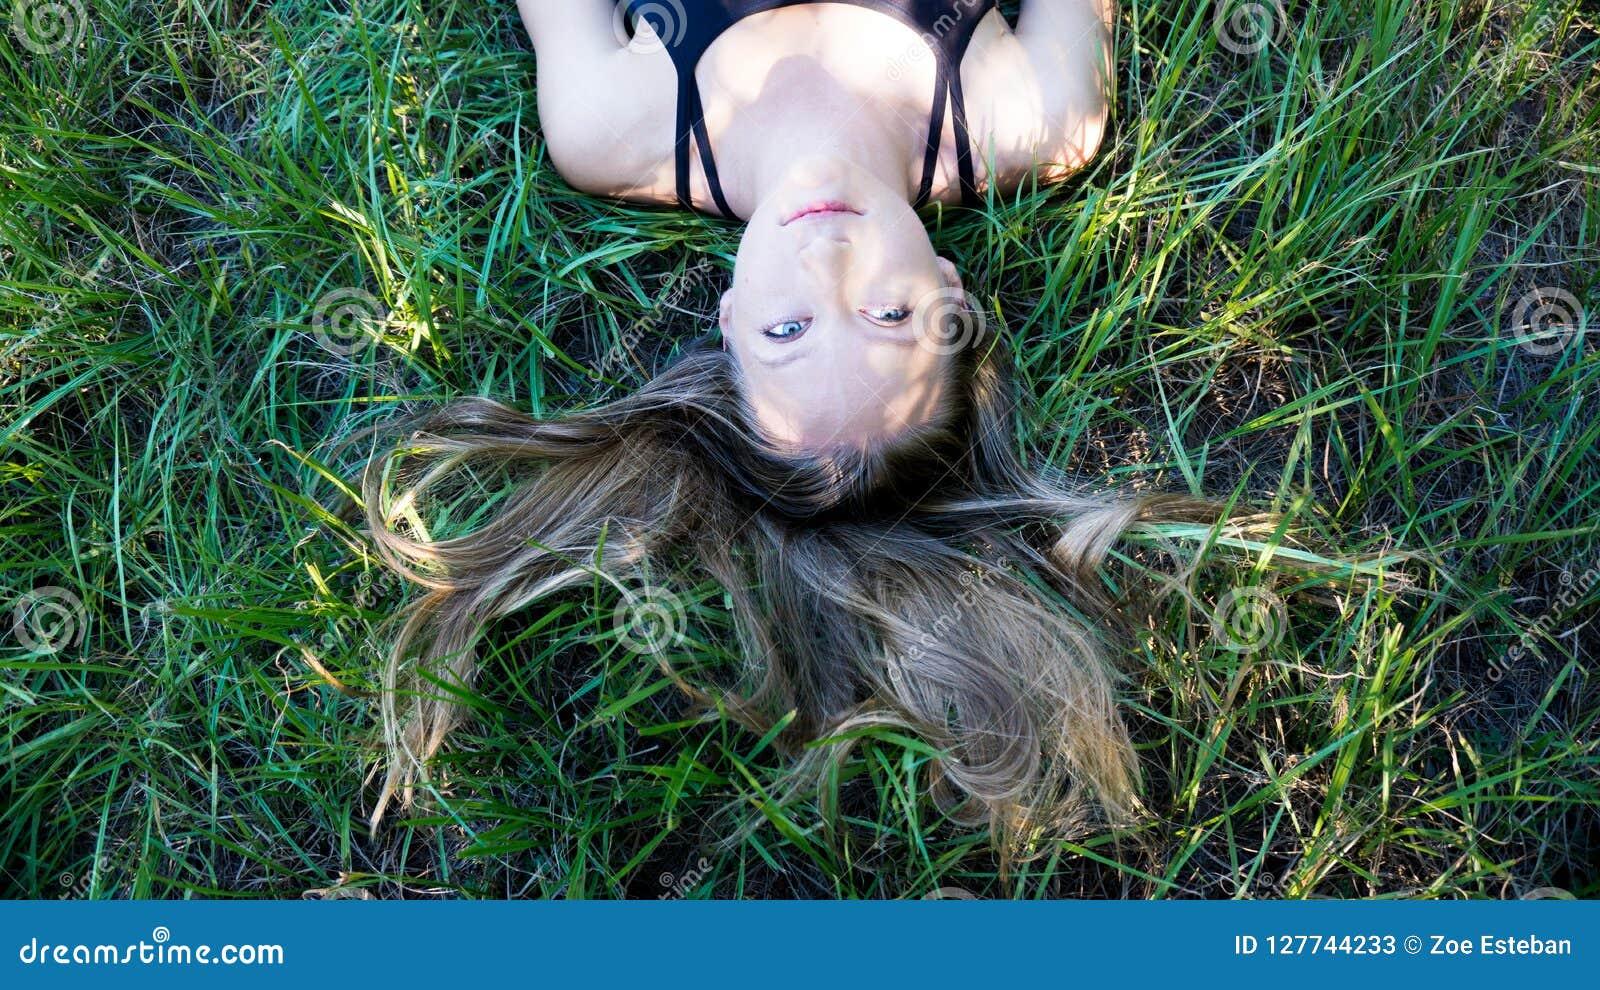 7,210 Nude Woman Close Up Photos - Free & Royalty-Free